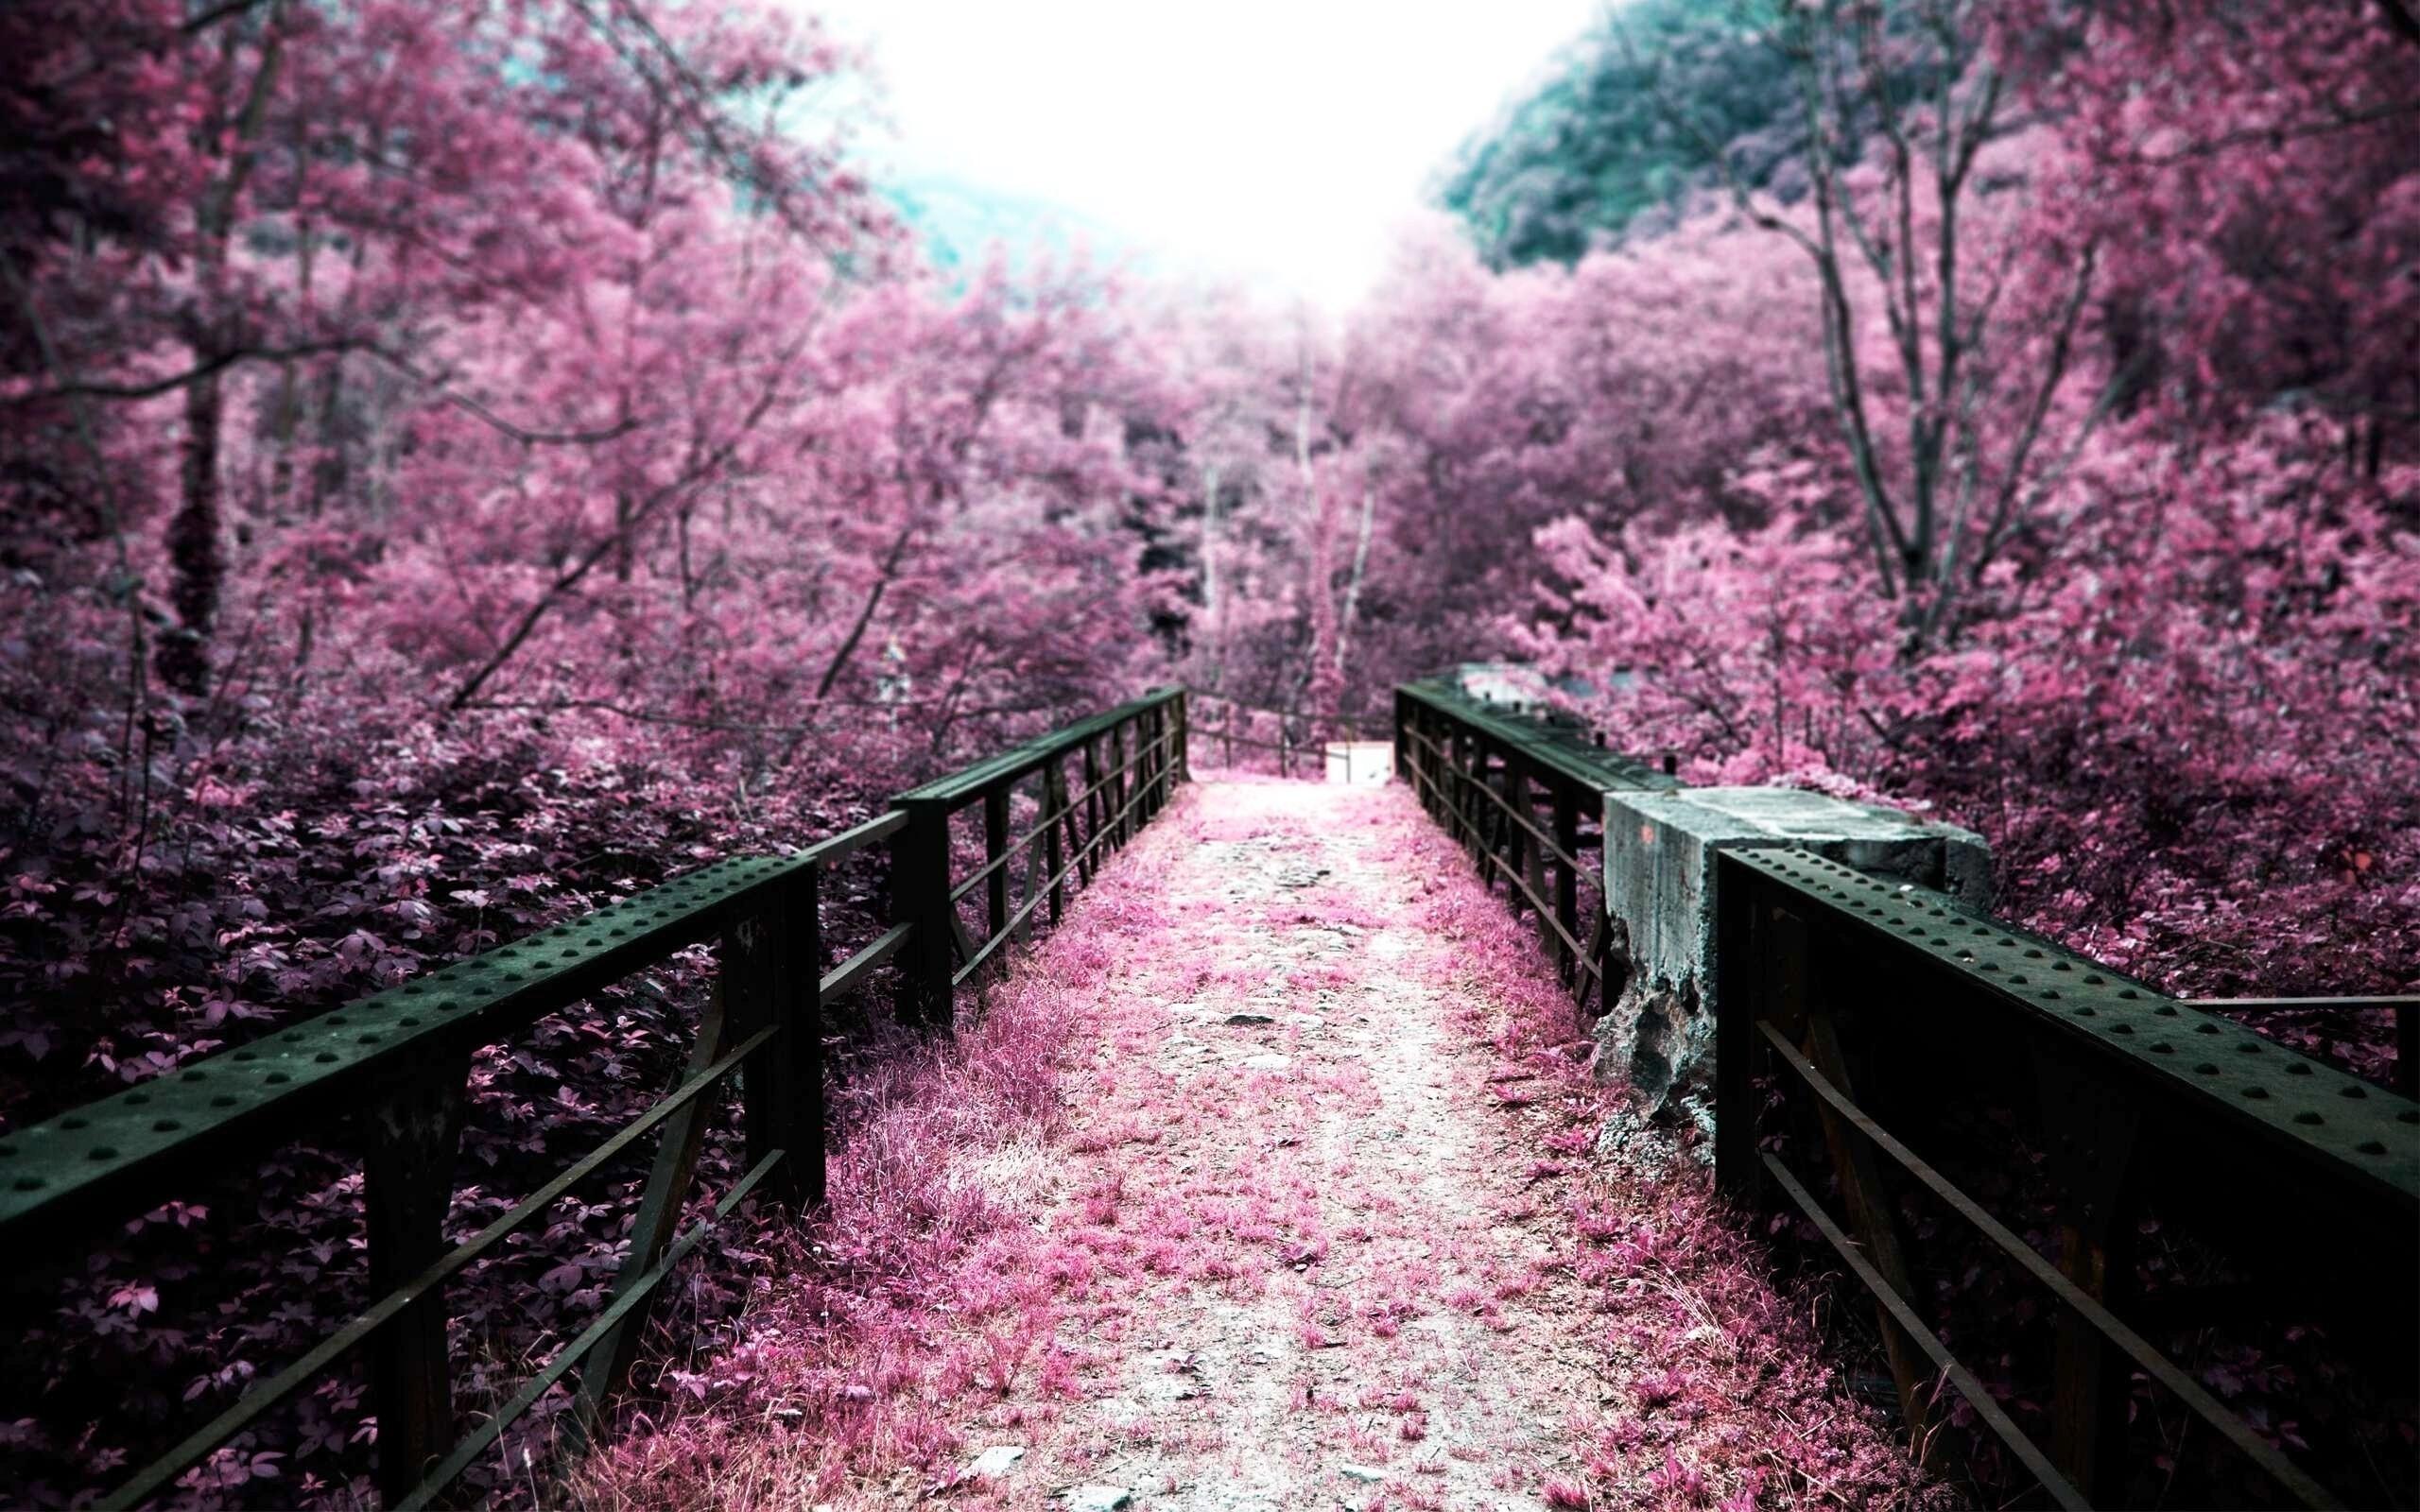 Nature Branch Cherry Blossom Spring Autumn Flower Plant Season 2560x1600 Px